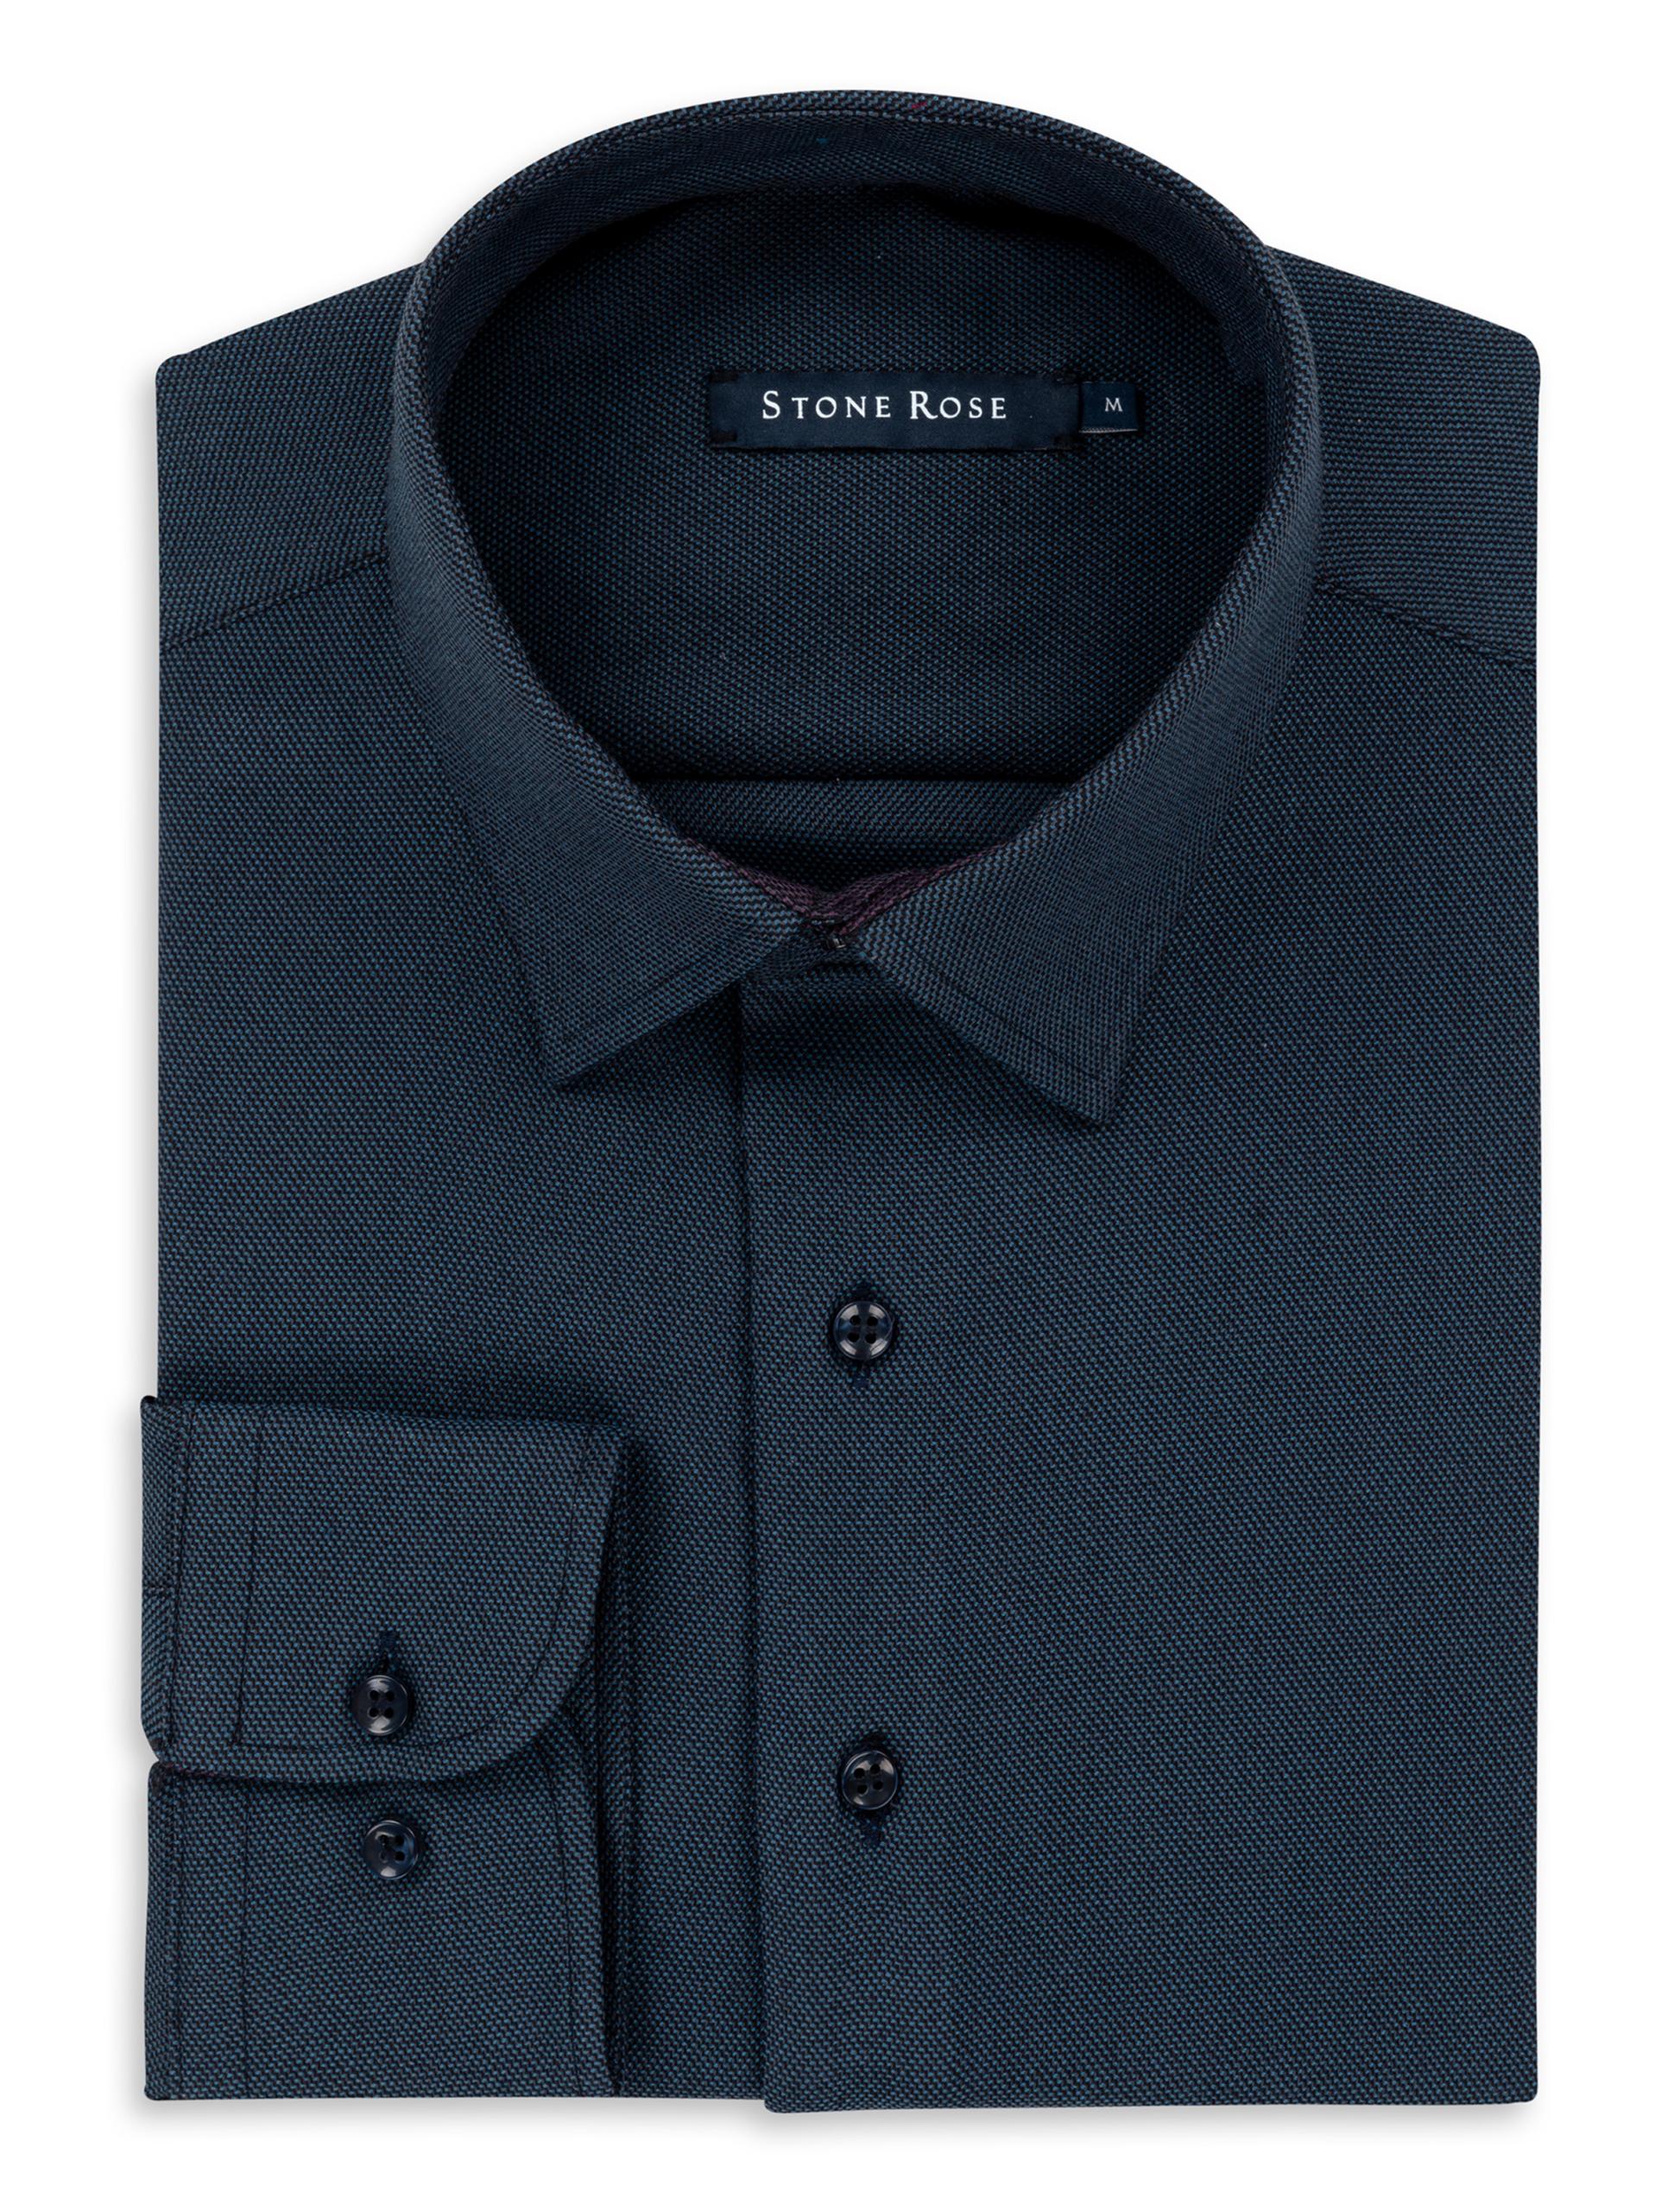 Stone Rose Blue Dry Touch Jacquard Long Sleeve Shirt